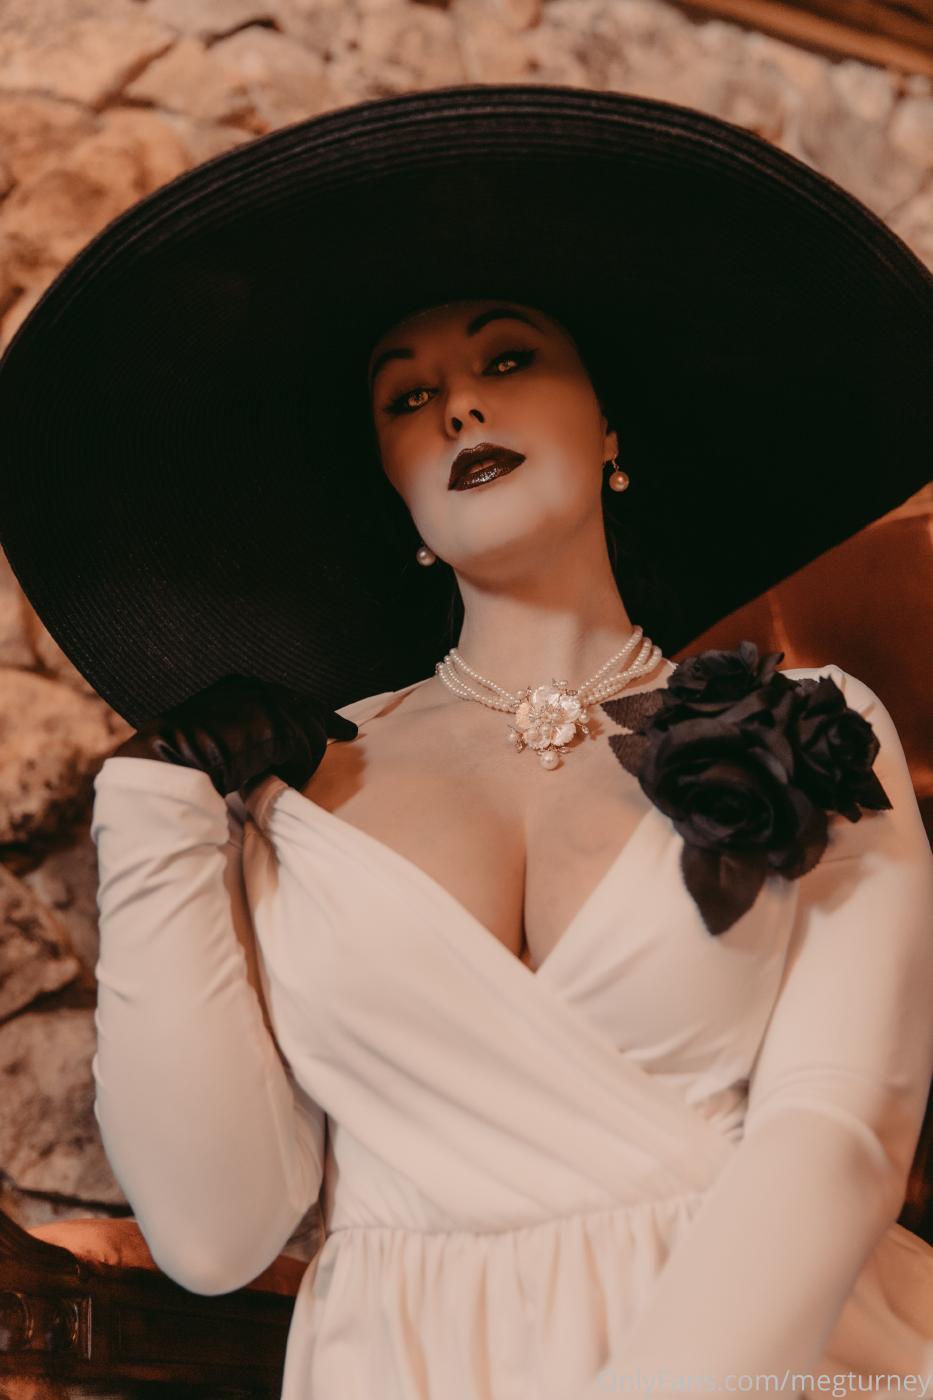 Meg Turney Lady Dimitrescu Cosplay Onlyfans Set Leaked 0036